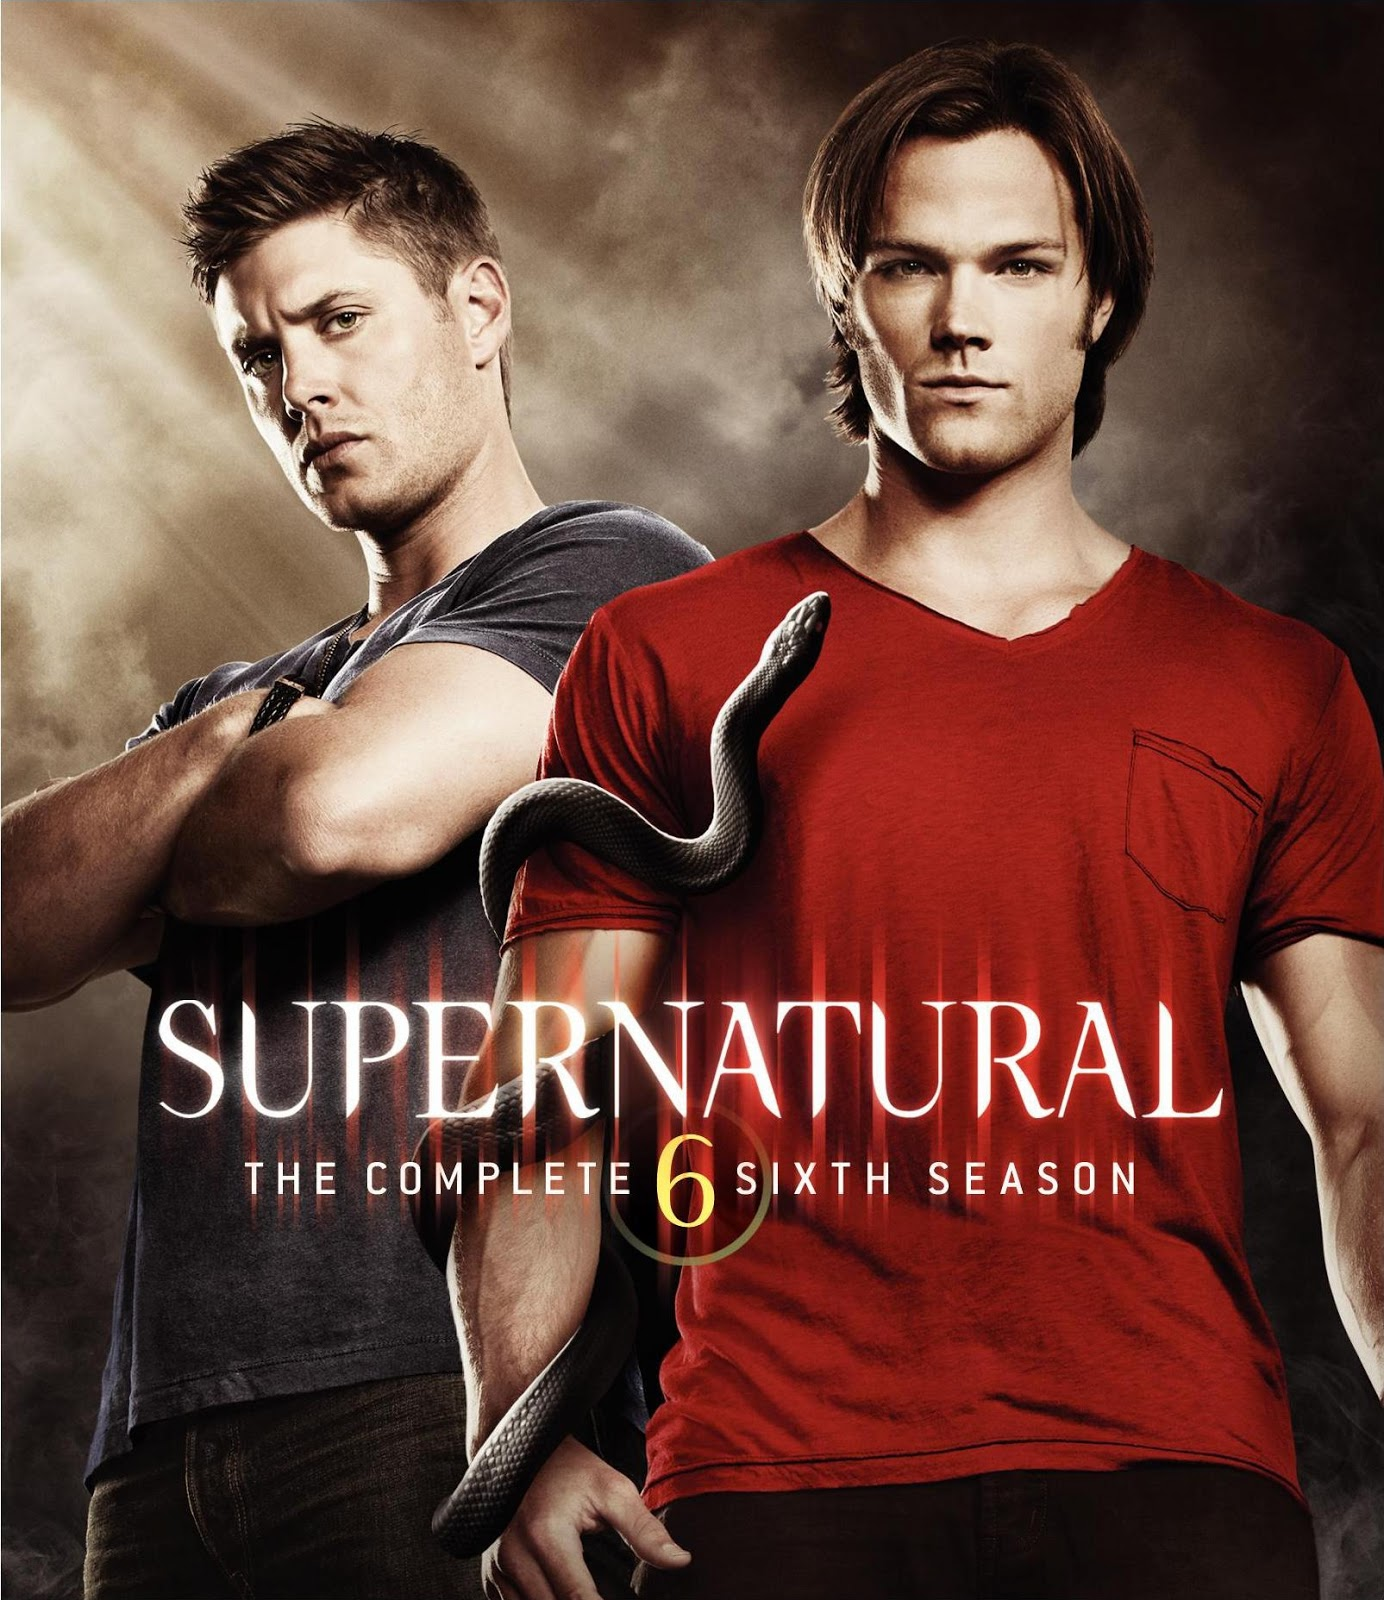 Supernatural Season 6 Complete Direct Download ~ Download For Free